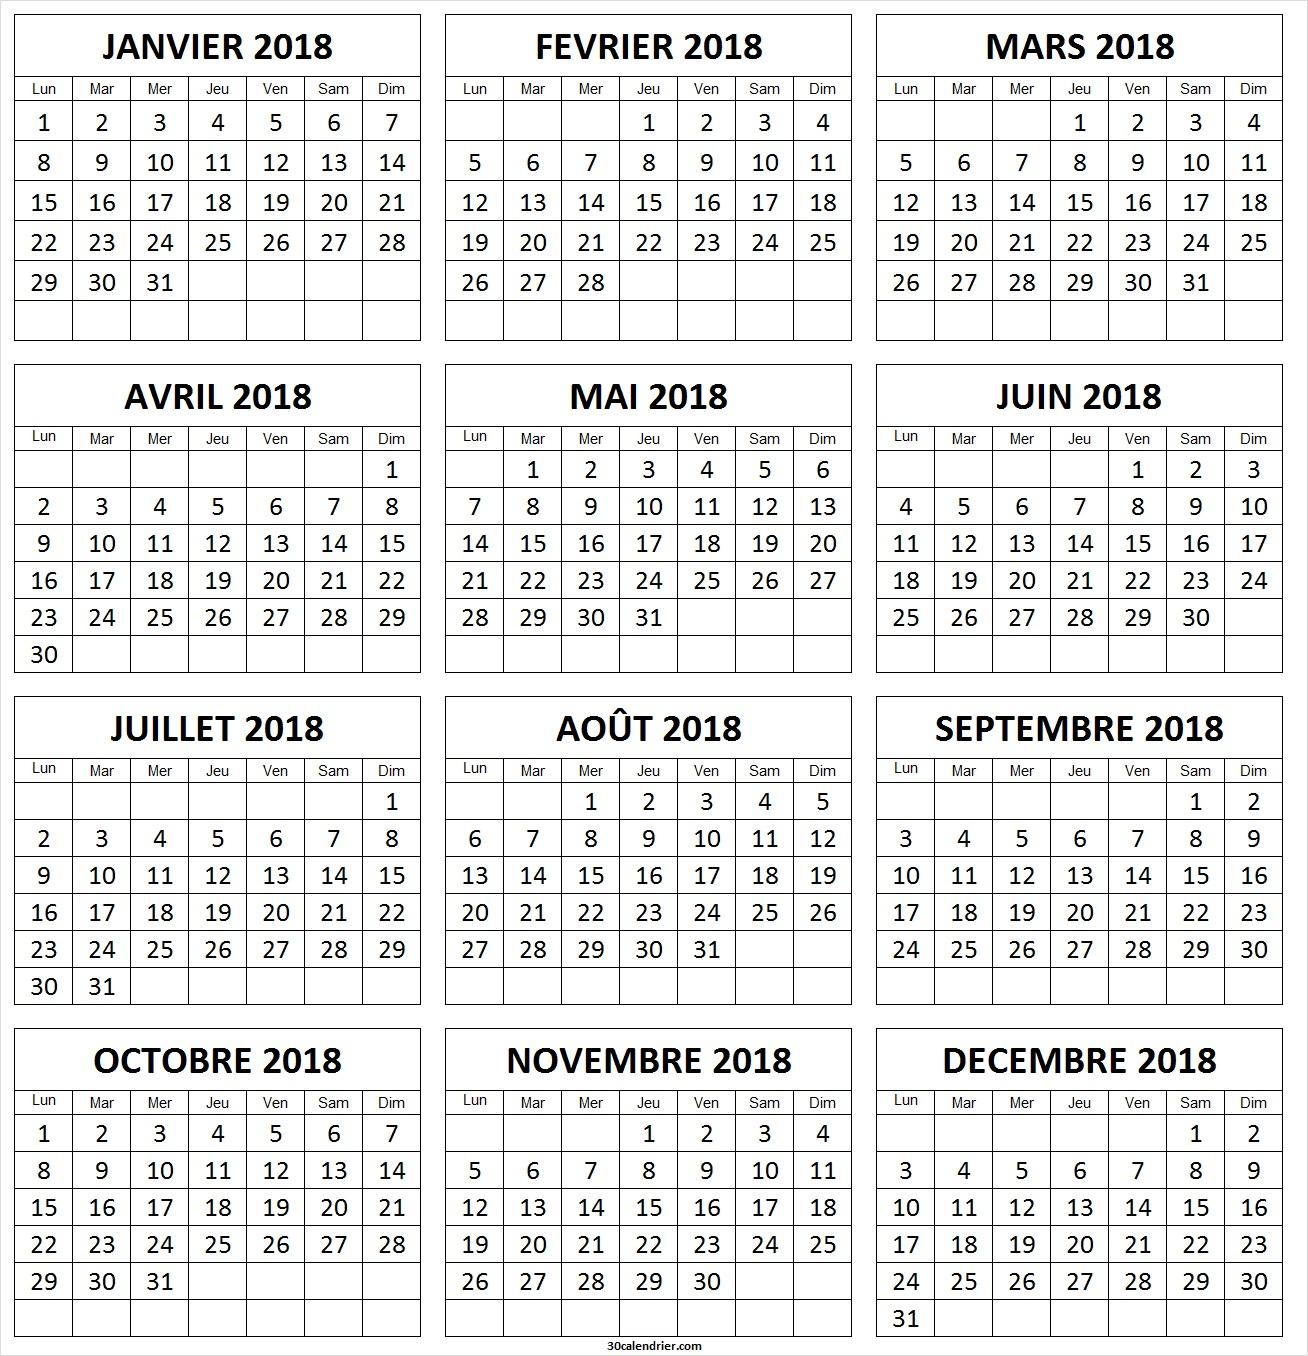 Calendrier 2018 À Imprimer Gratuites | Calendrier 2018 à Calendrier Annuel 2018 À Imprimer